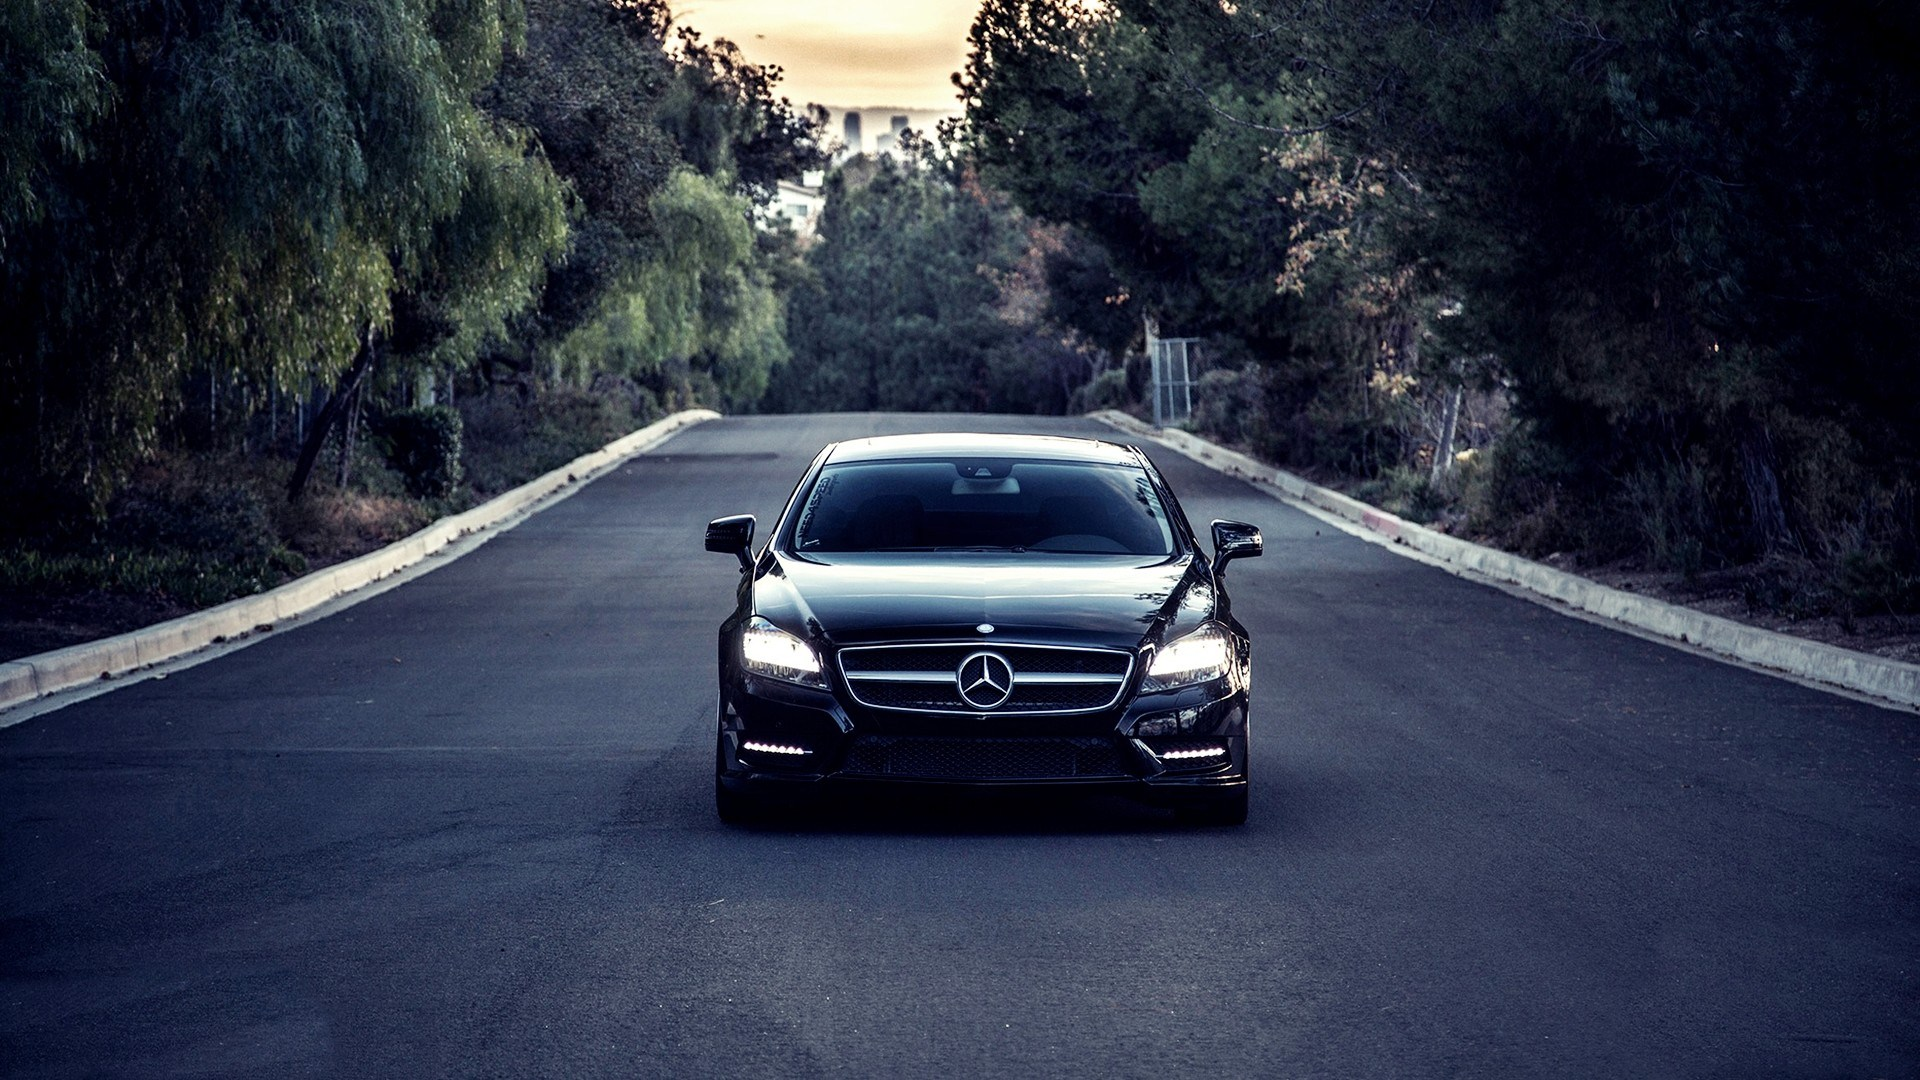 Mercedes HD Wallpaper - WallpaperSafari